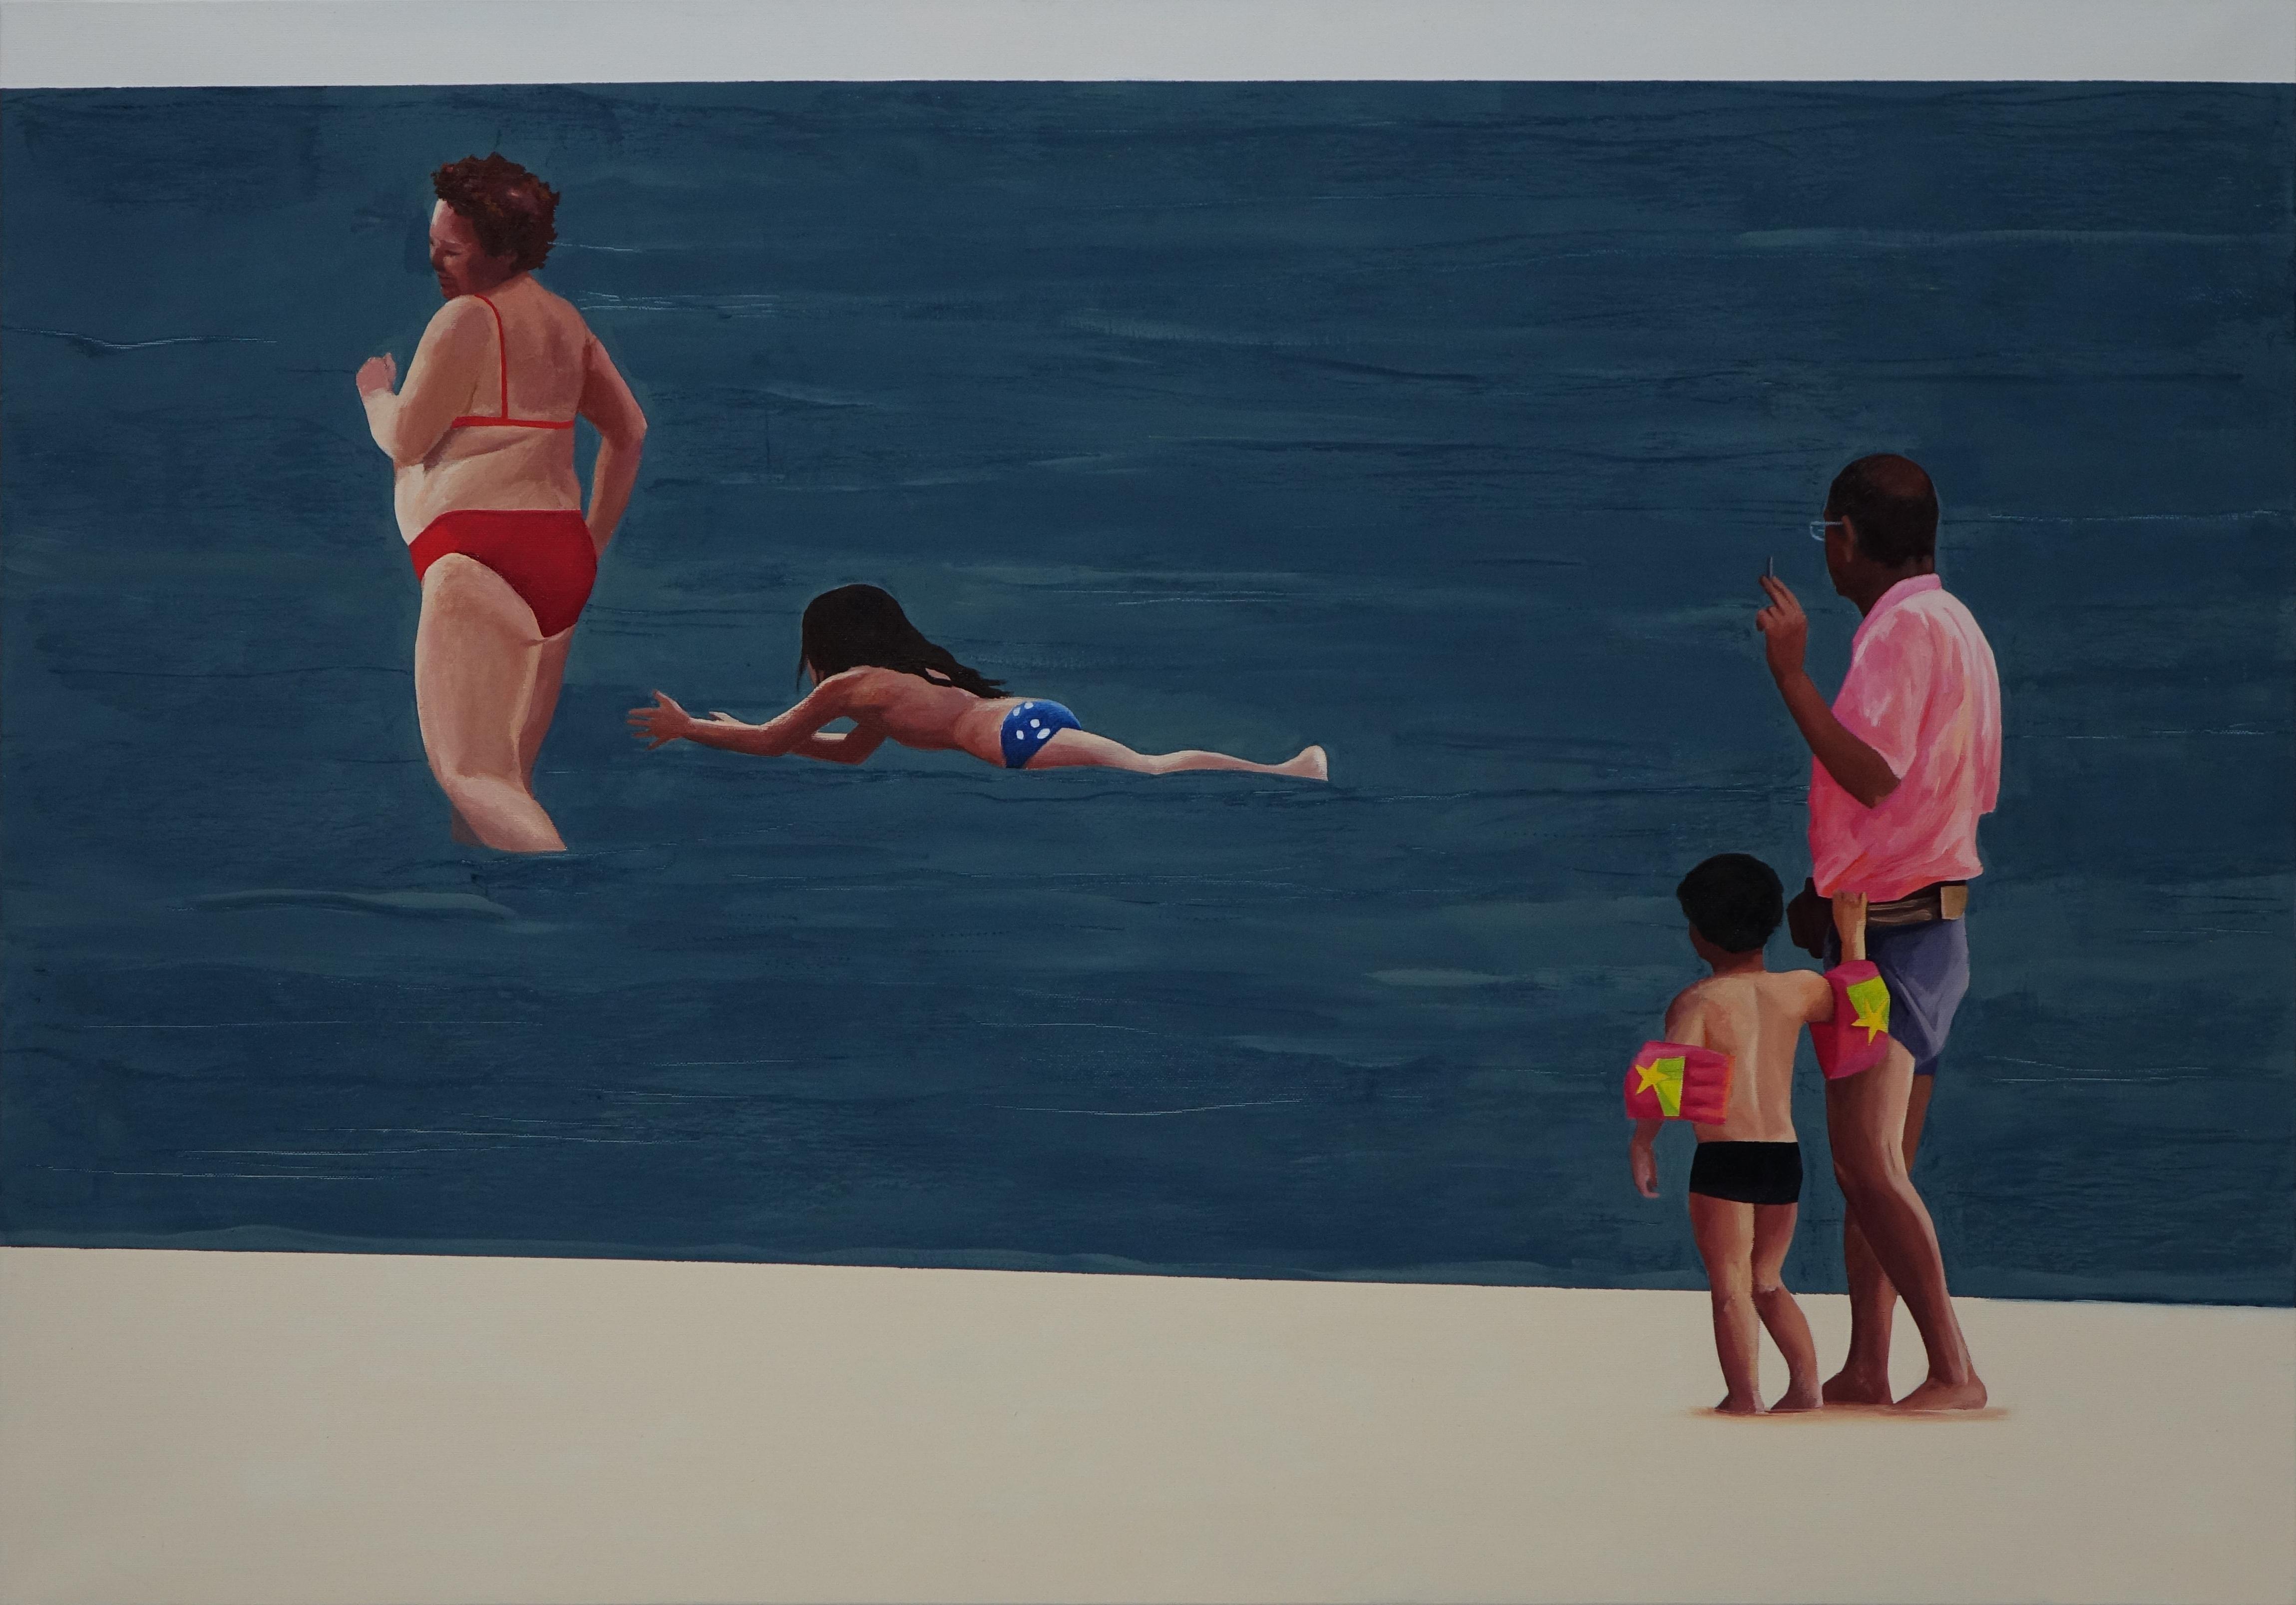 Grandparents - Contemporary Figurative Oil Painting, Sea View, Realism, Joyful